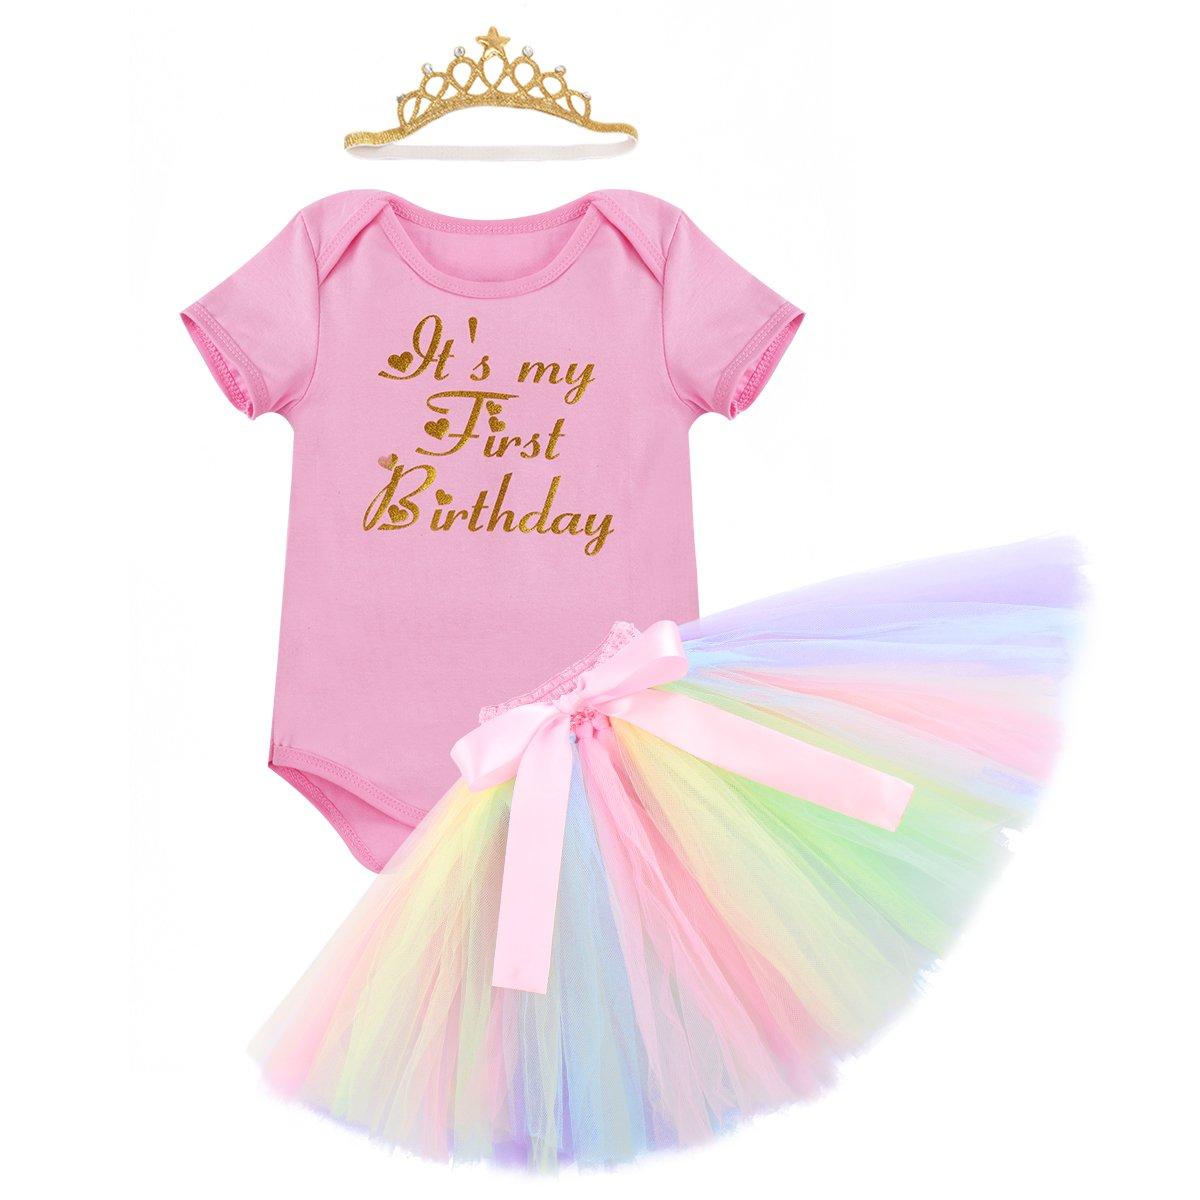 Yaphyee Baby Girls Birthday Smash Cake Outfit 3Pcs Unicorn Romper Skirt Headband